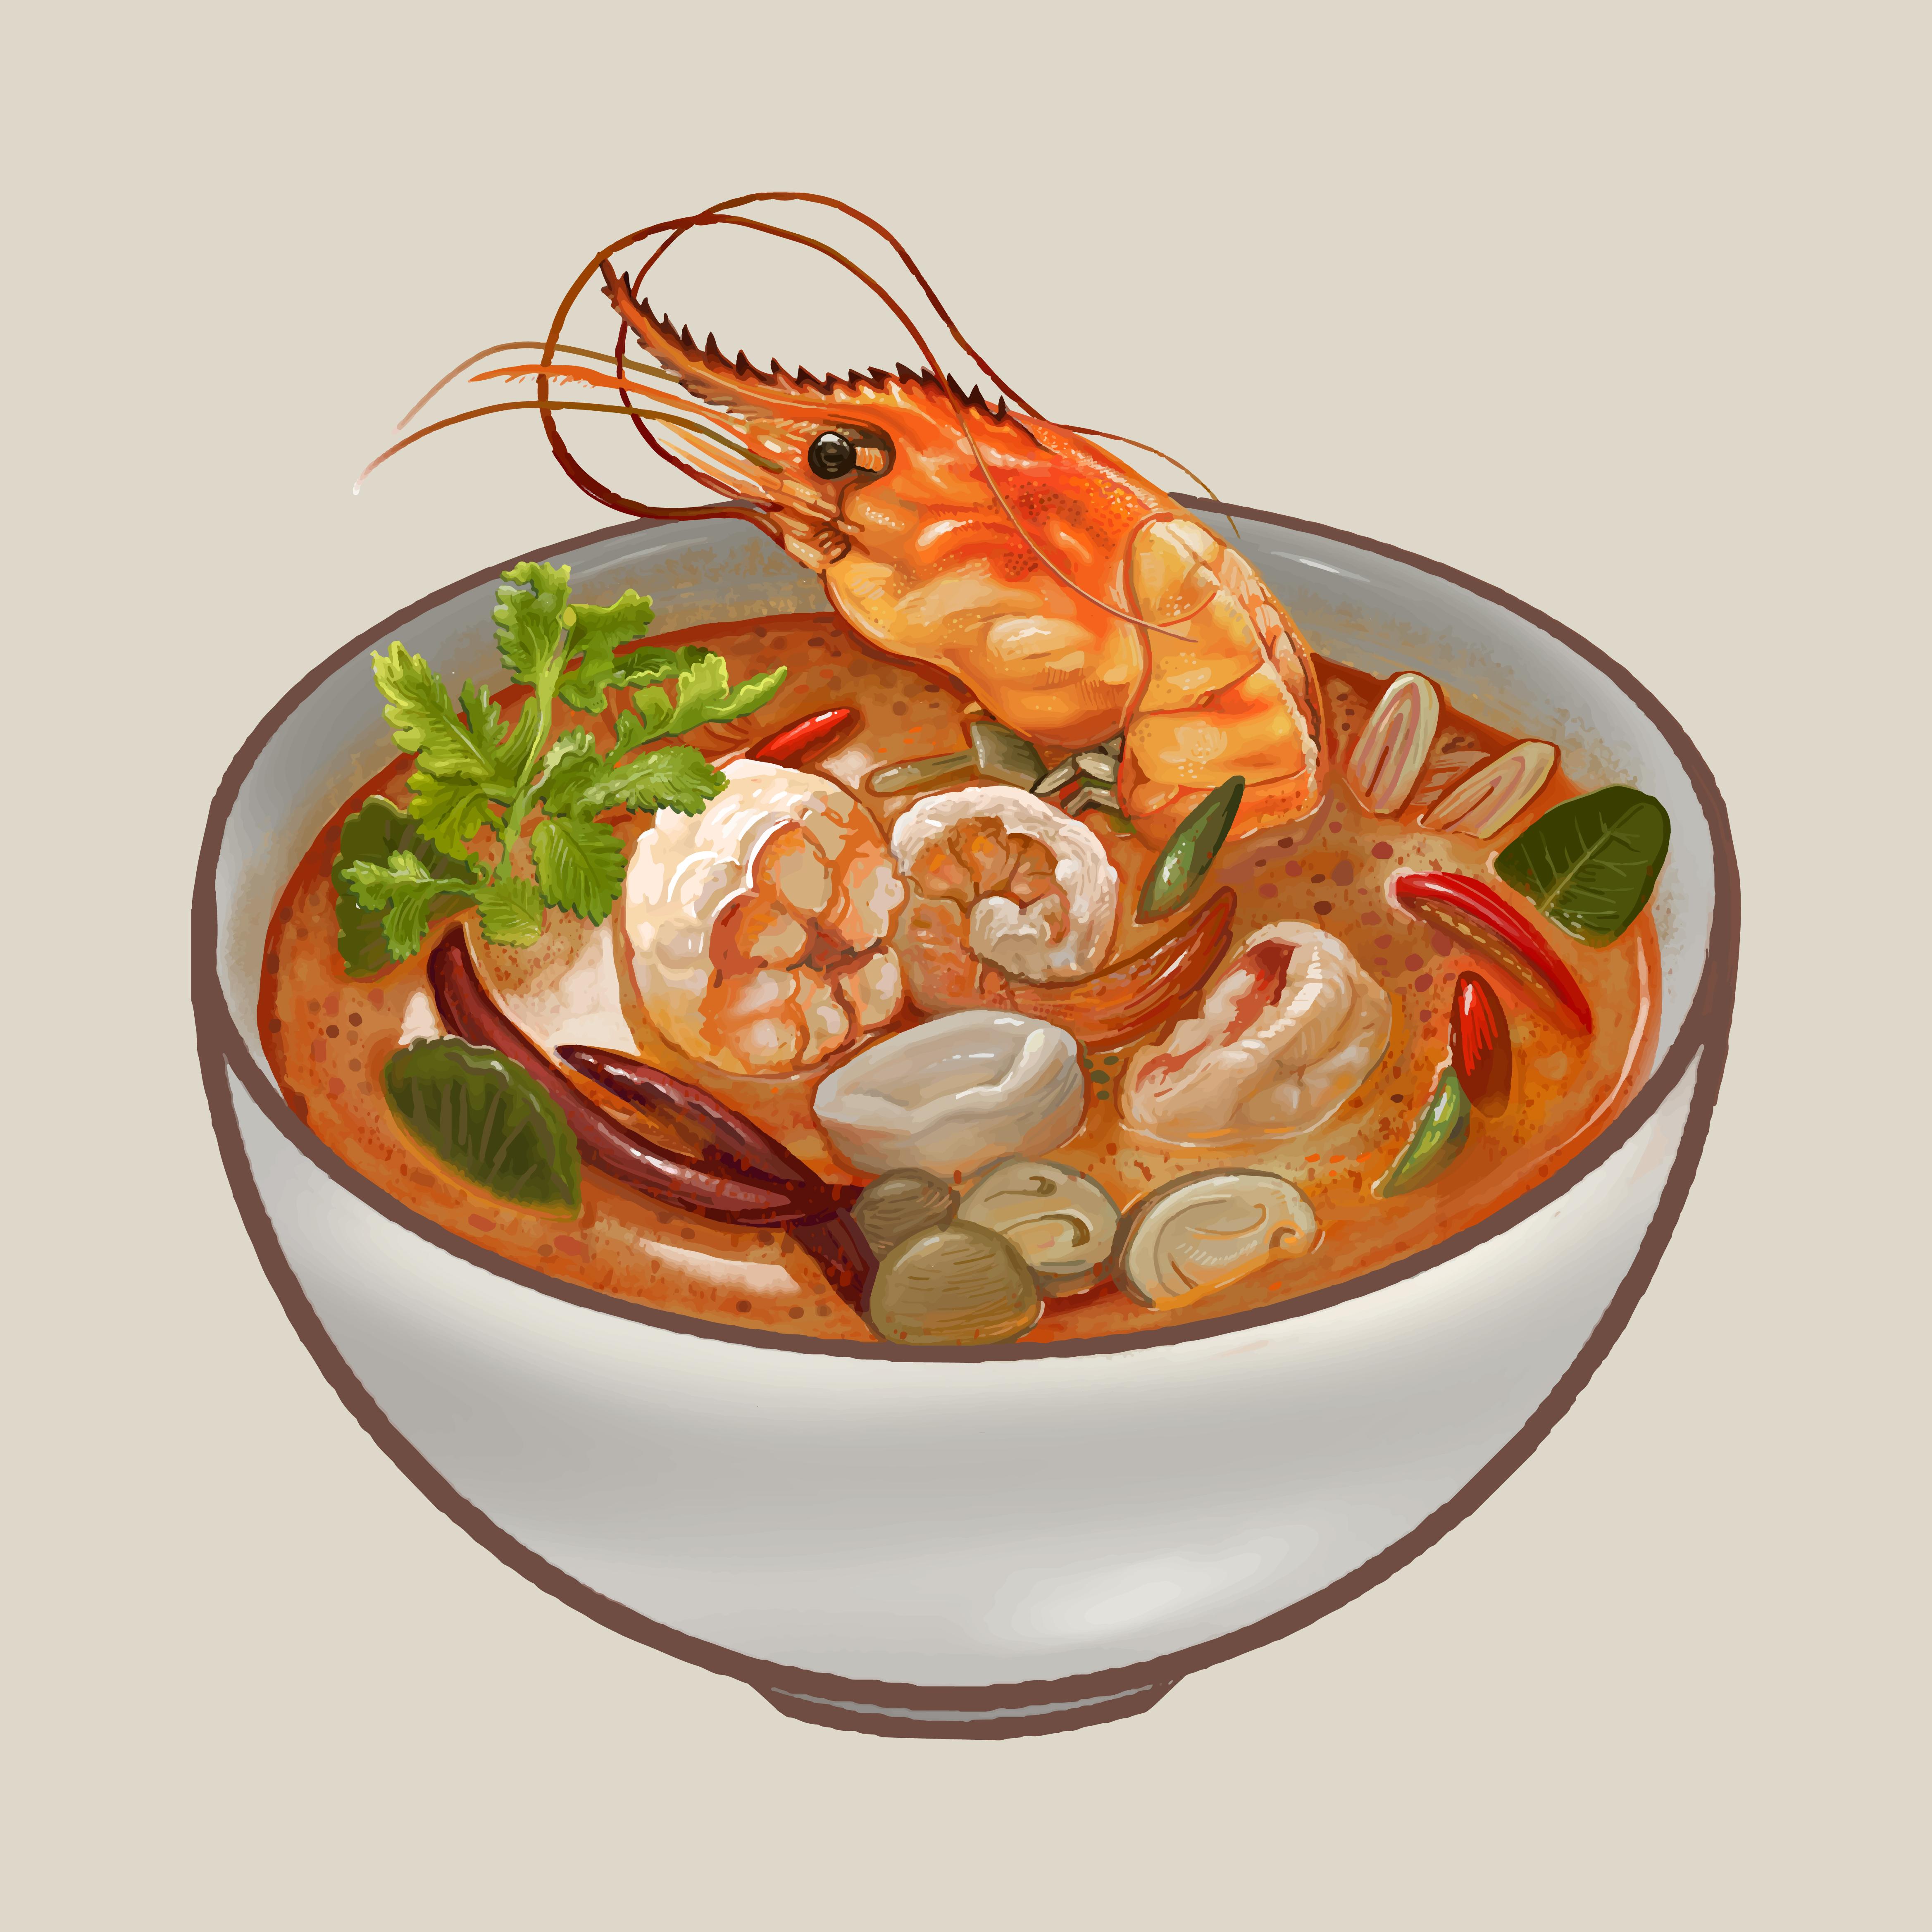 Tom Yum Kung Soup Illustration